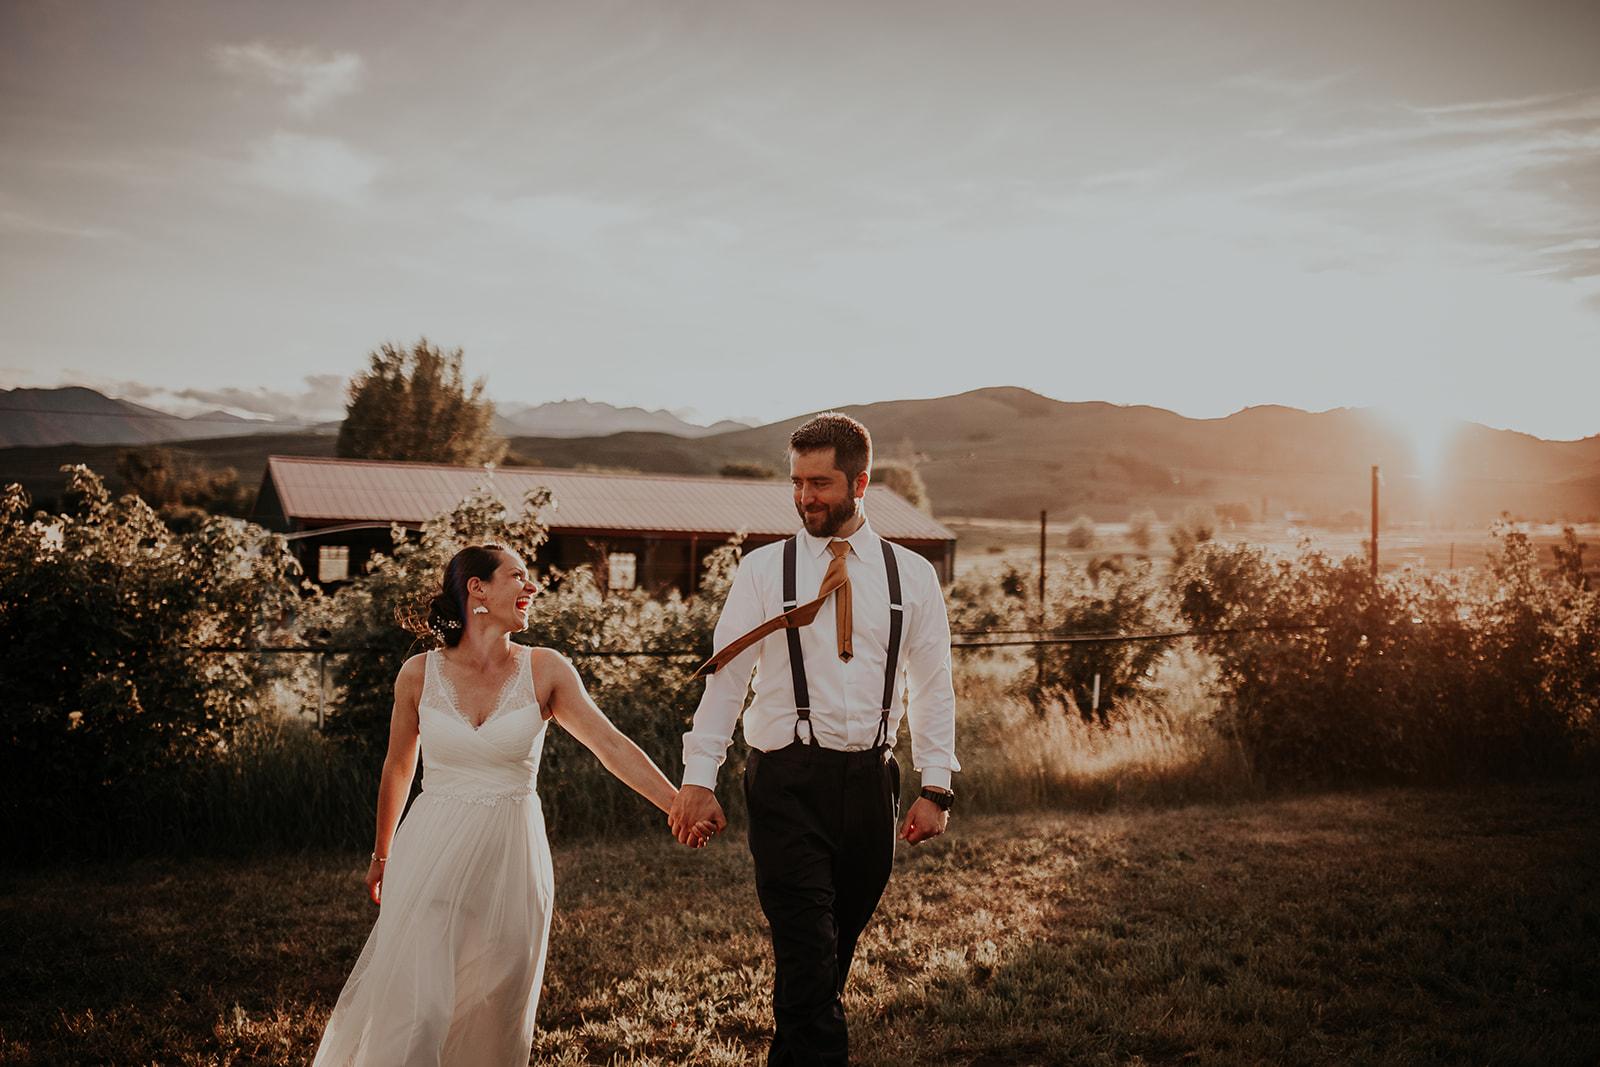 north-cascades-elopement-wedding-winthrop-wedding-photographer-megan-gallagher-photography (33).jpg